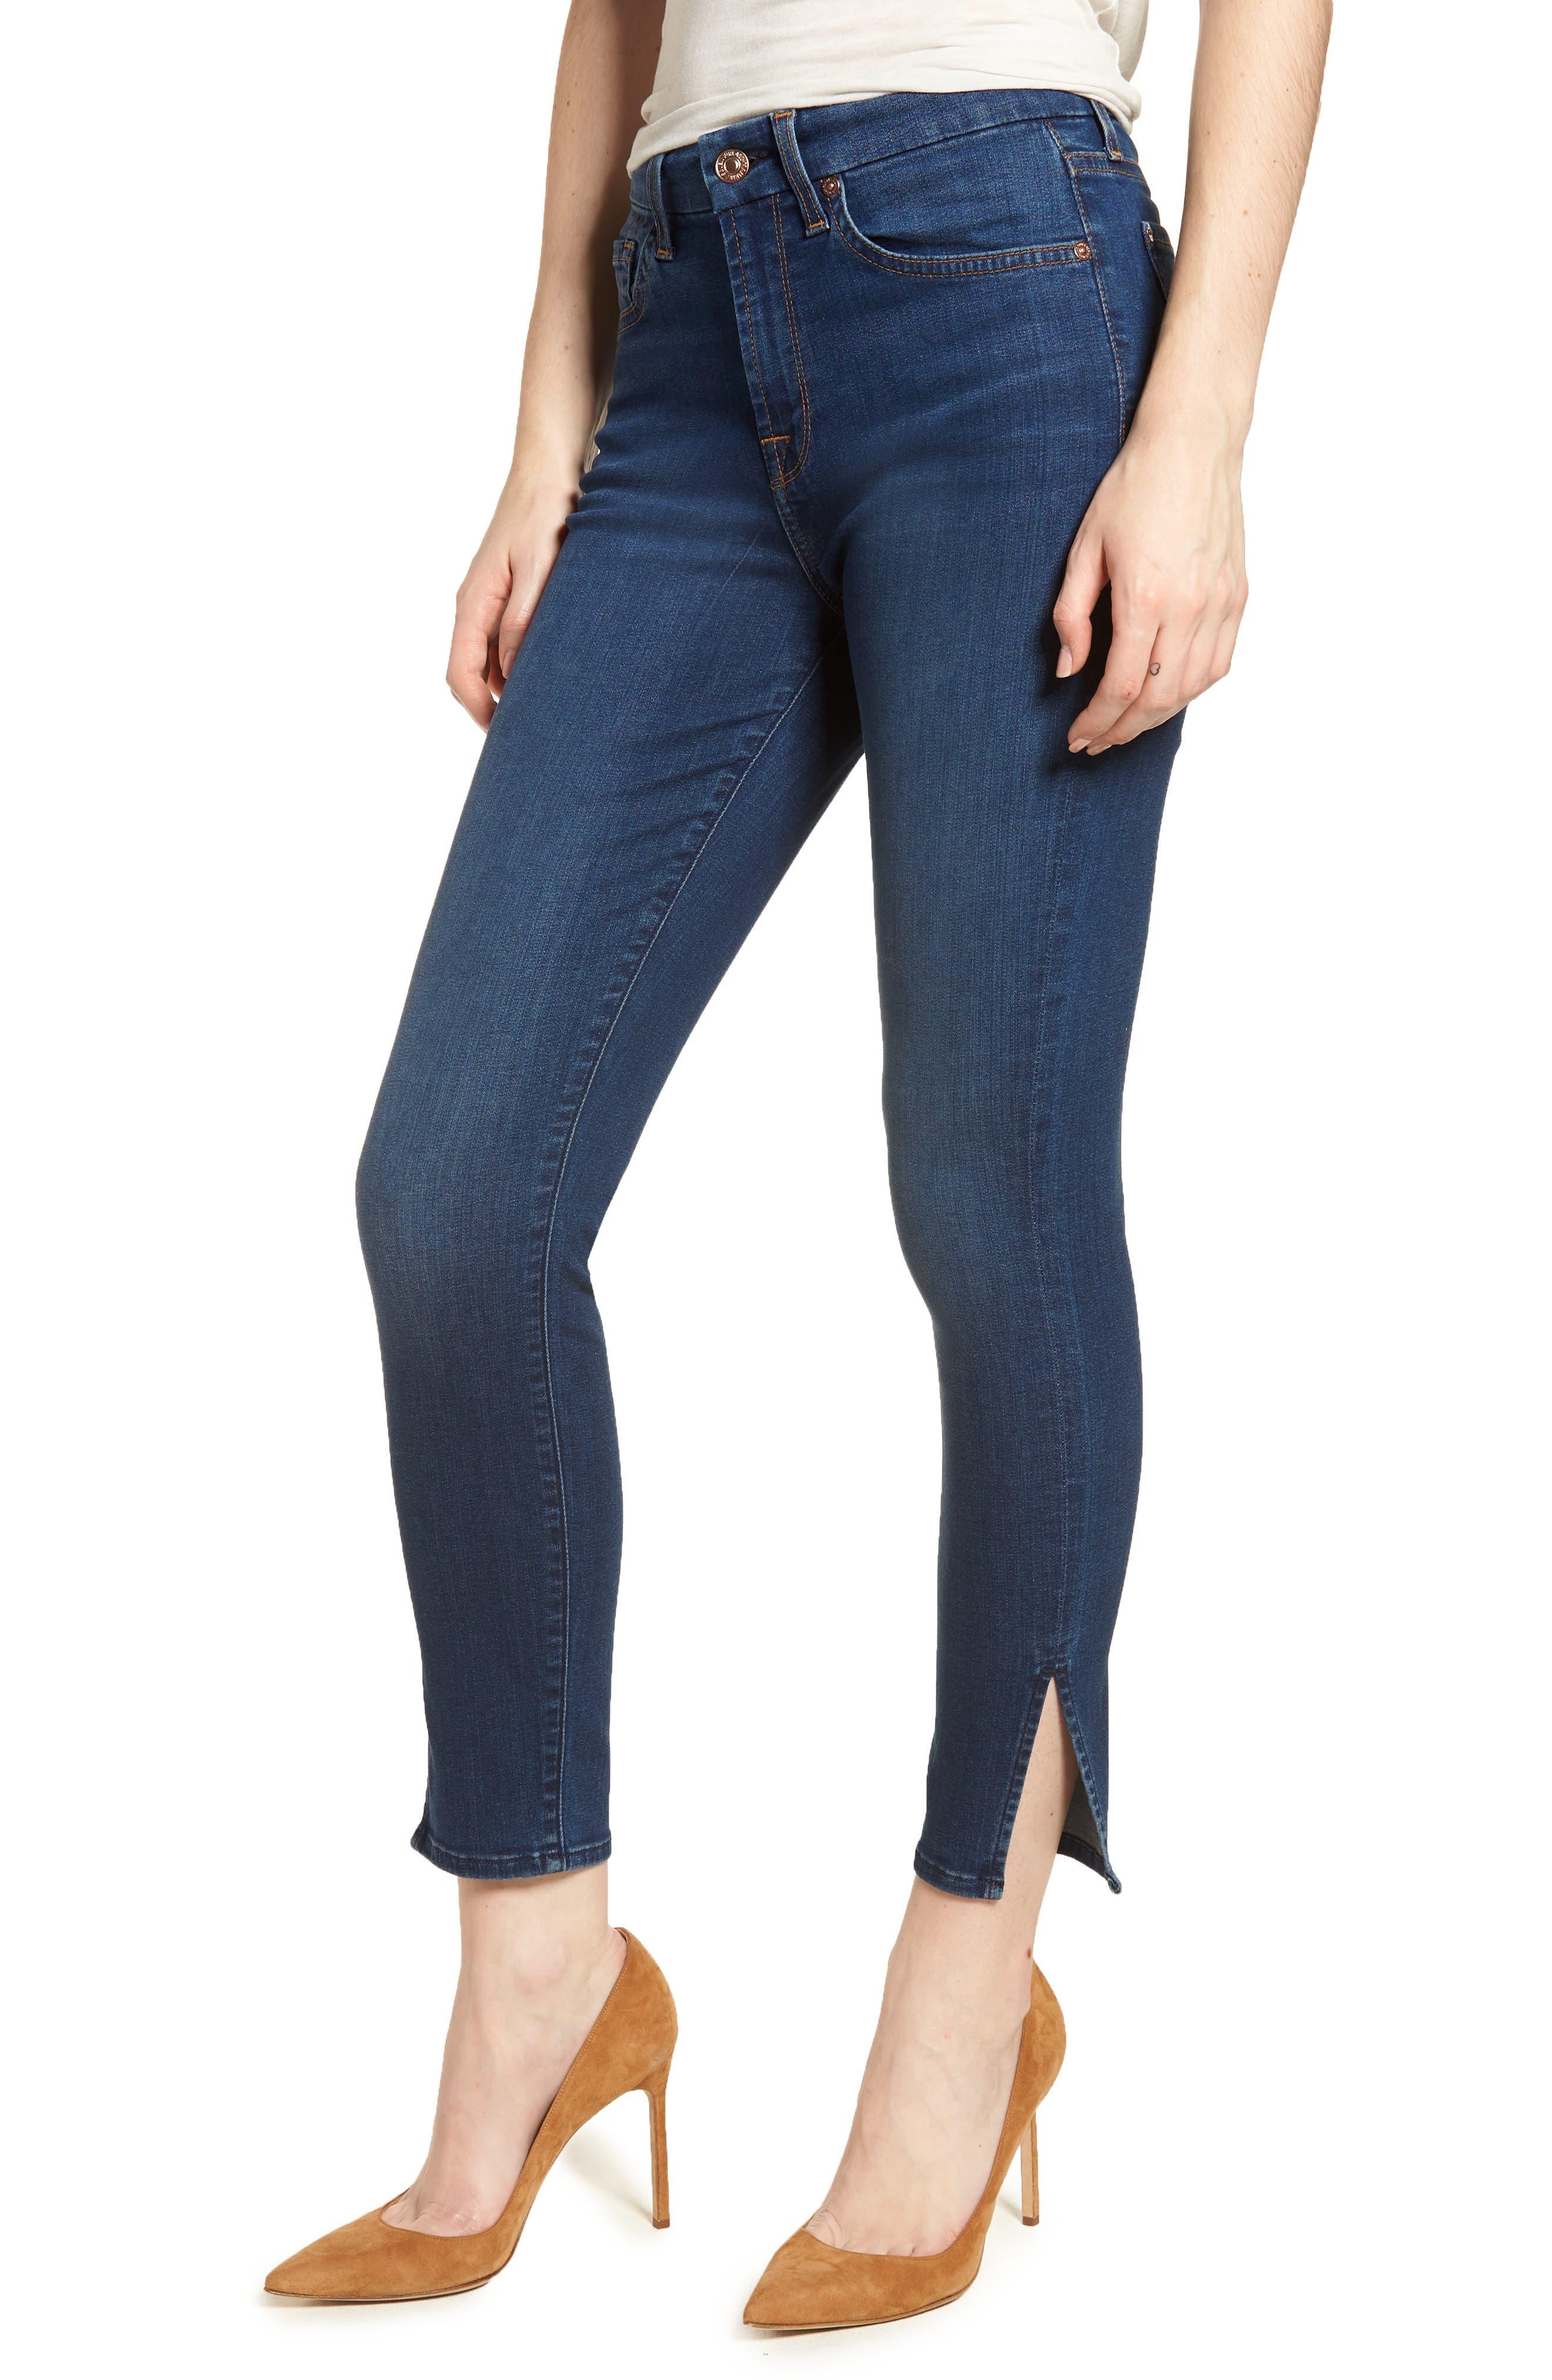 b(air) - Aubrey High Waist Skinny Jeans,                         Main,                         color, Bair Fresh Rinse